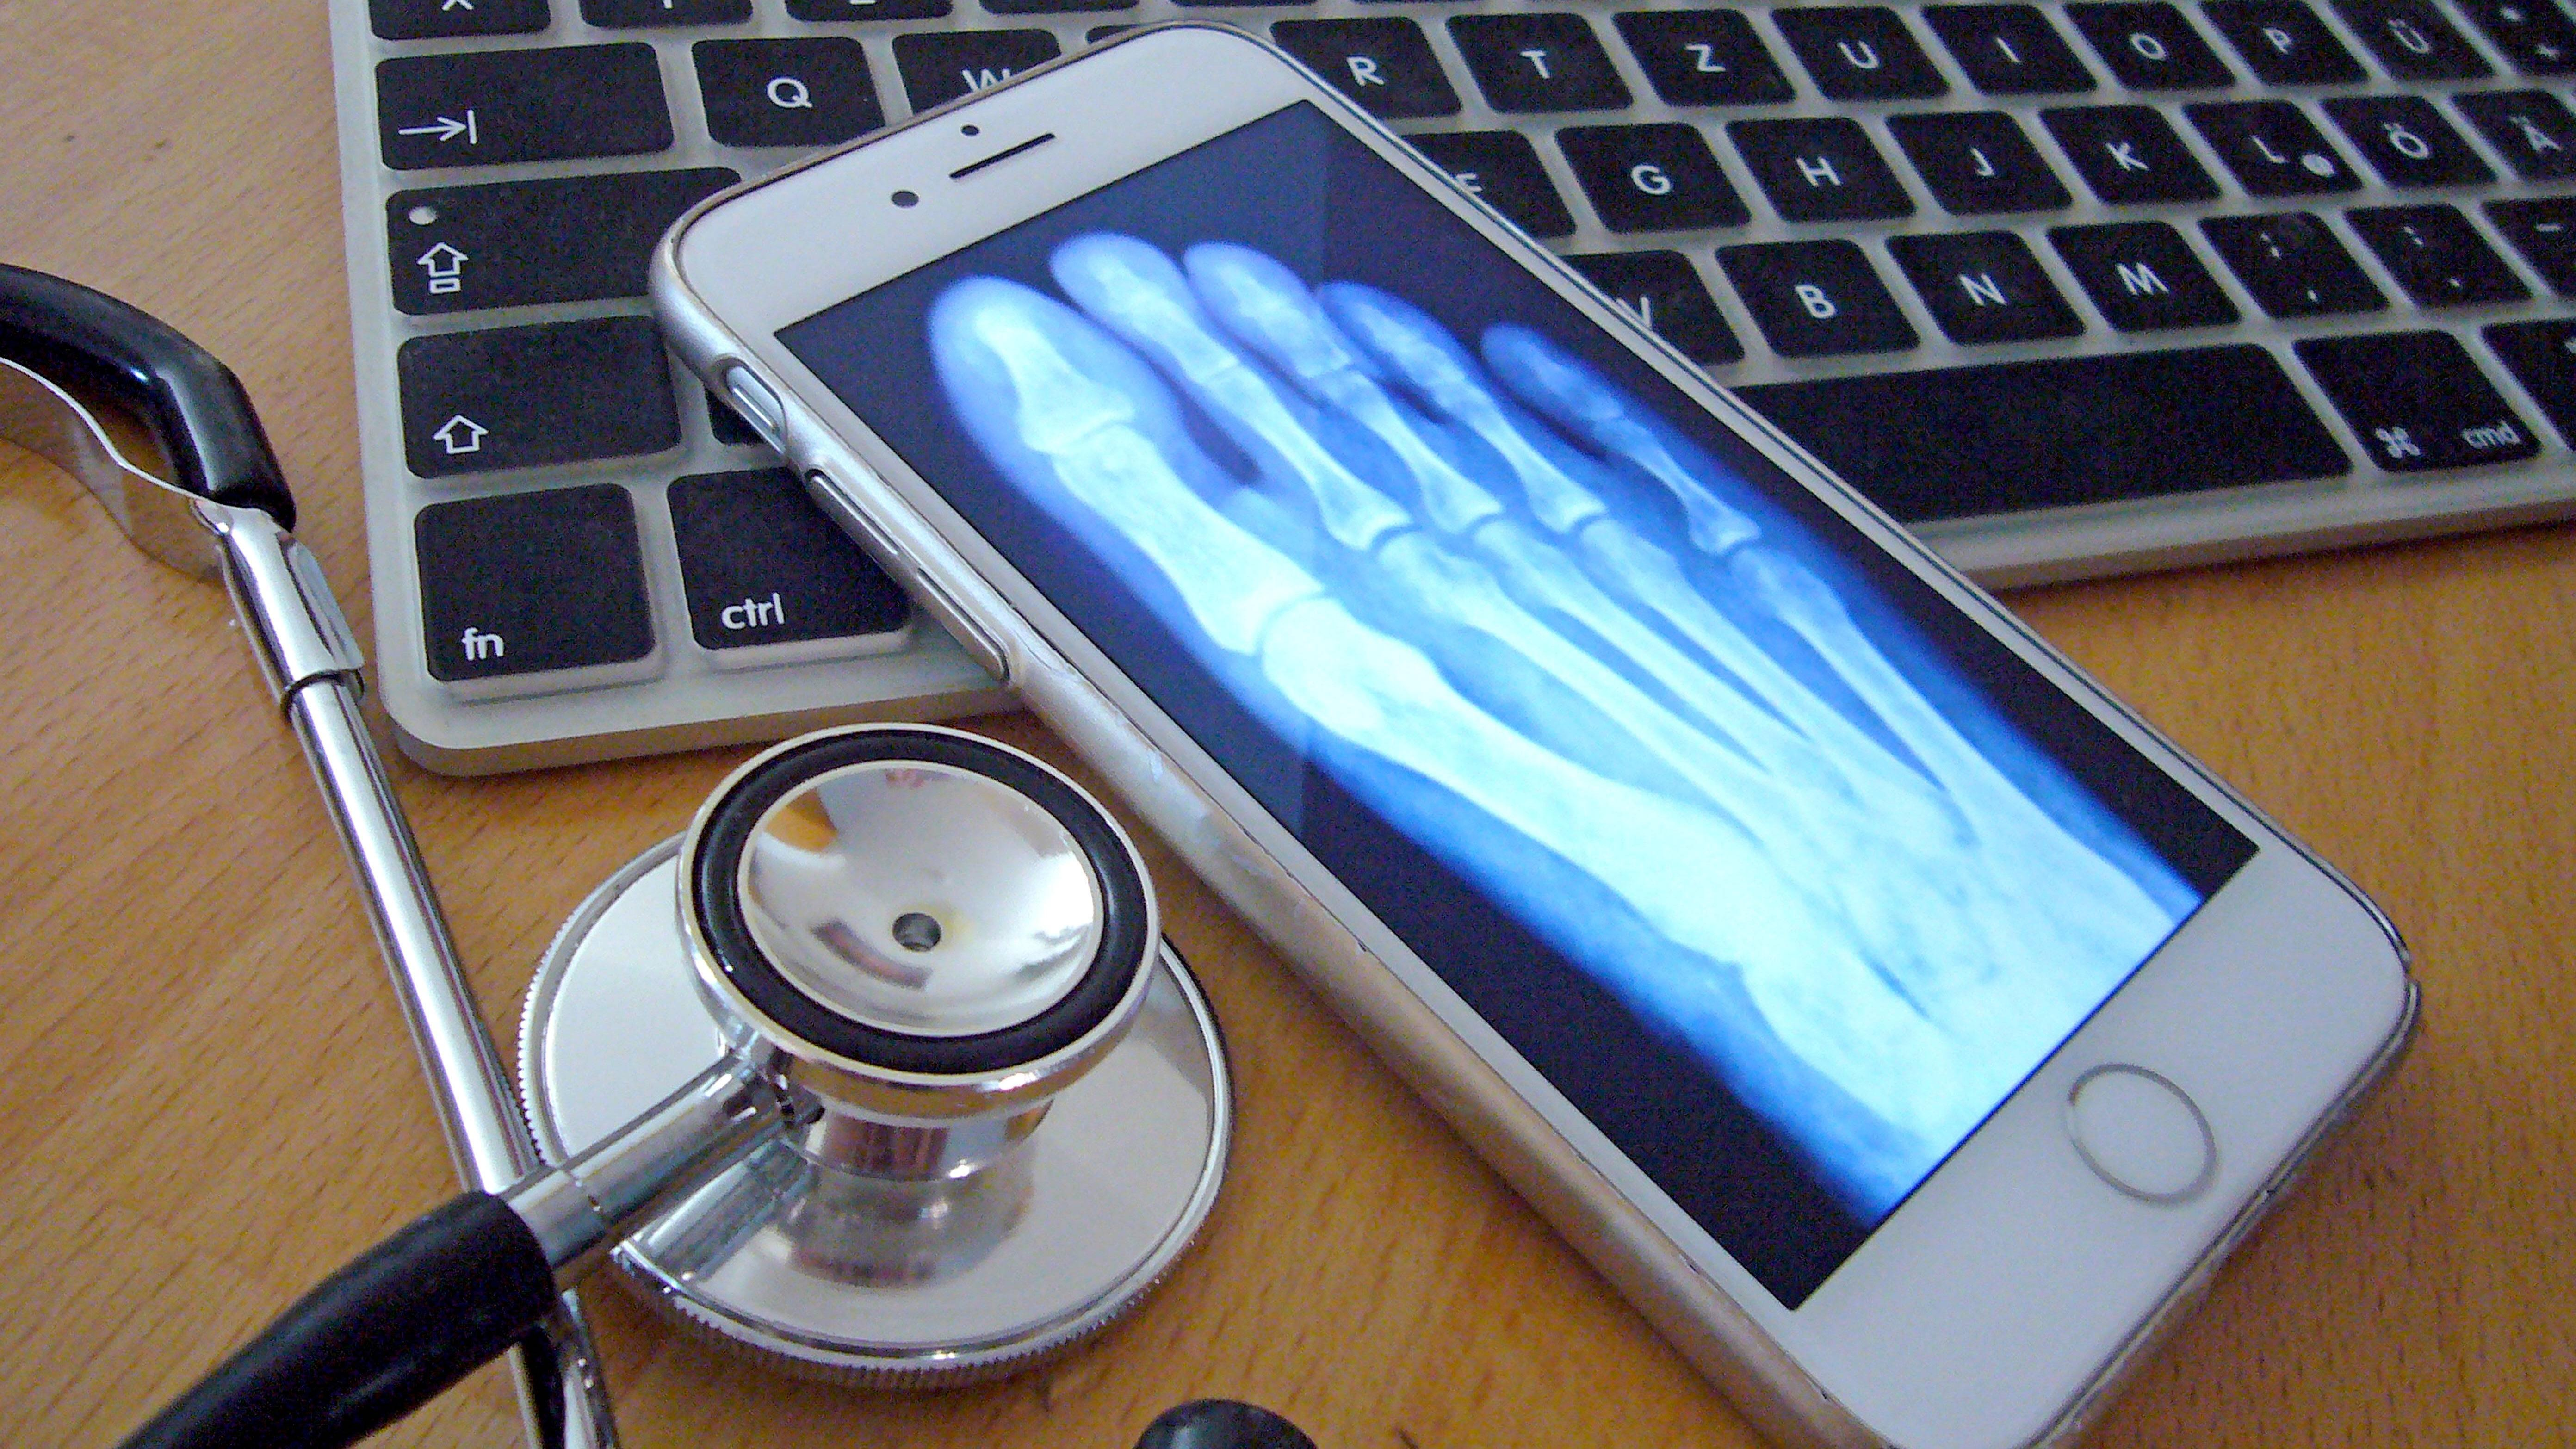 Medizinische Diagnose: Bedeutung per App entschlüsseln